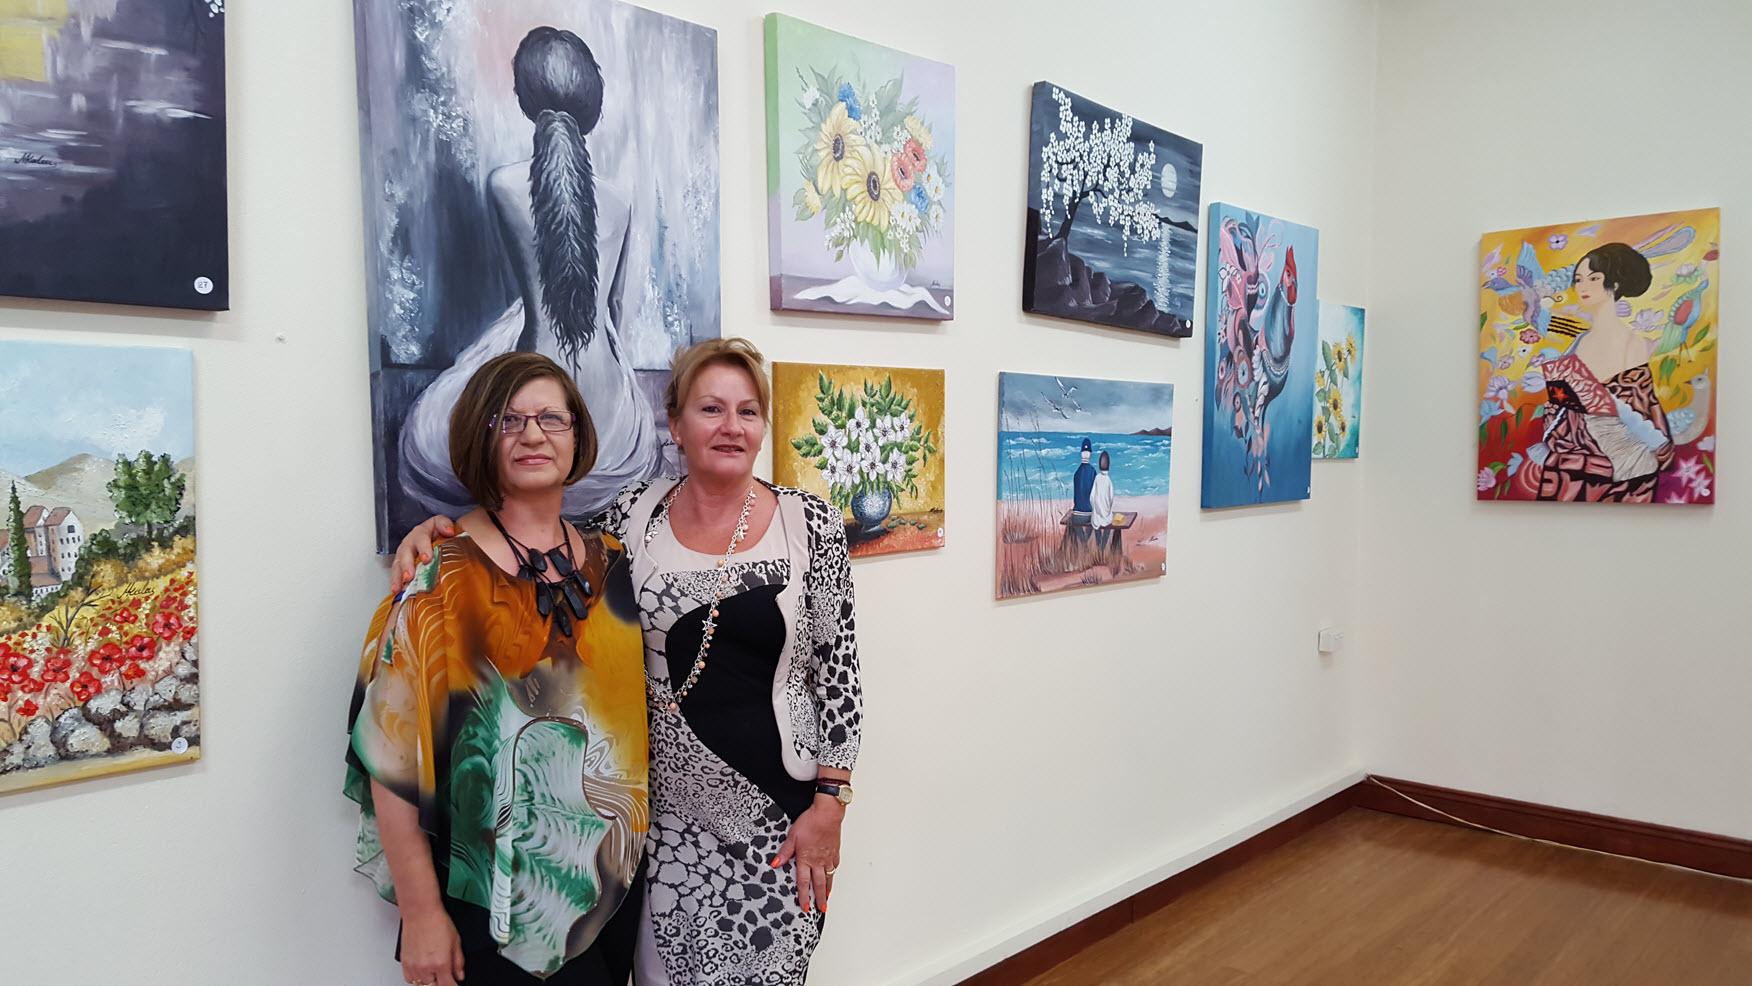 Artist Mary Kalaitzis with Toula Mavroudis among the paintings